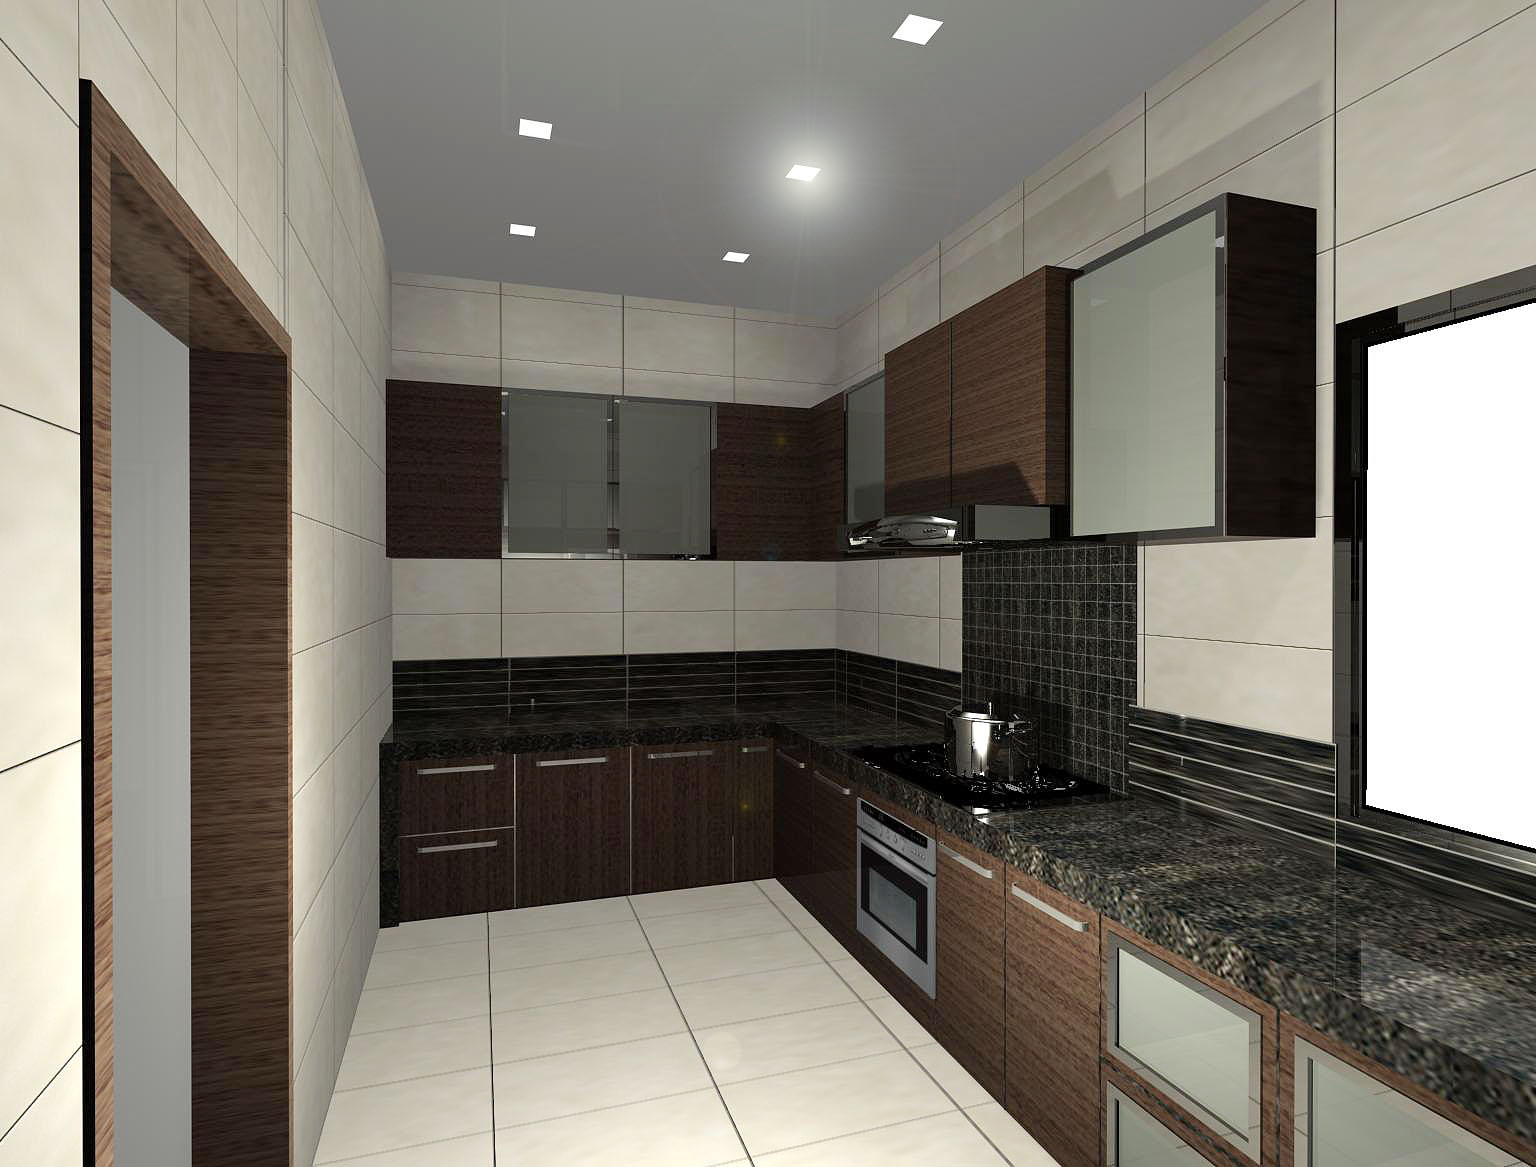 Mica Interior Design and Construction